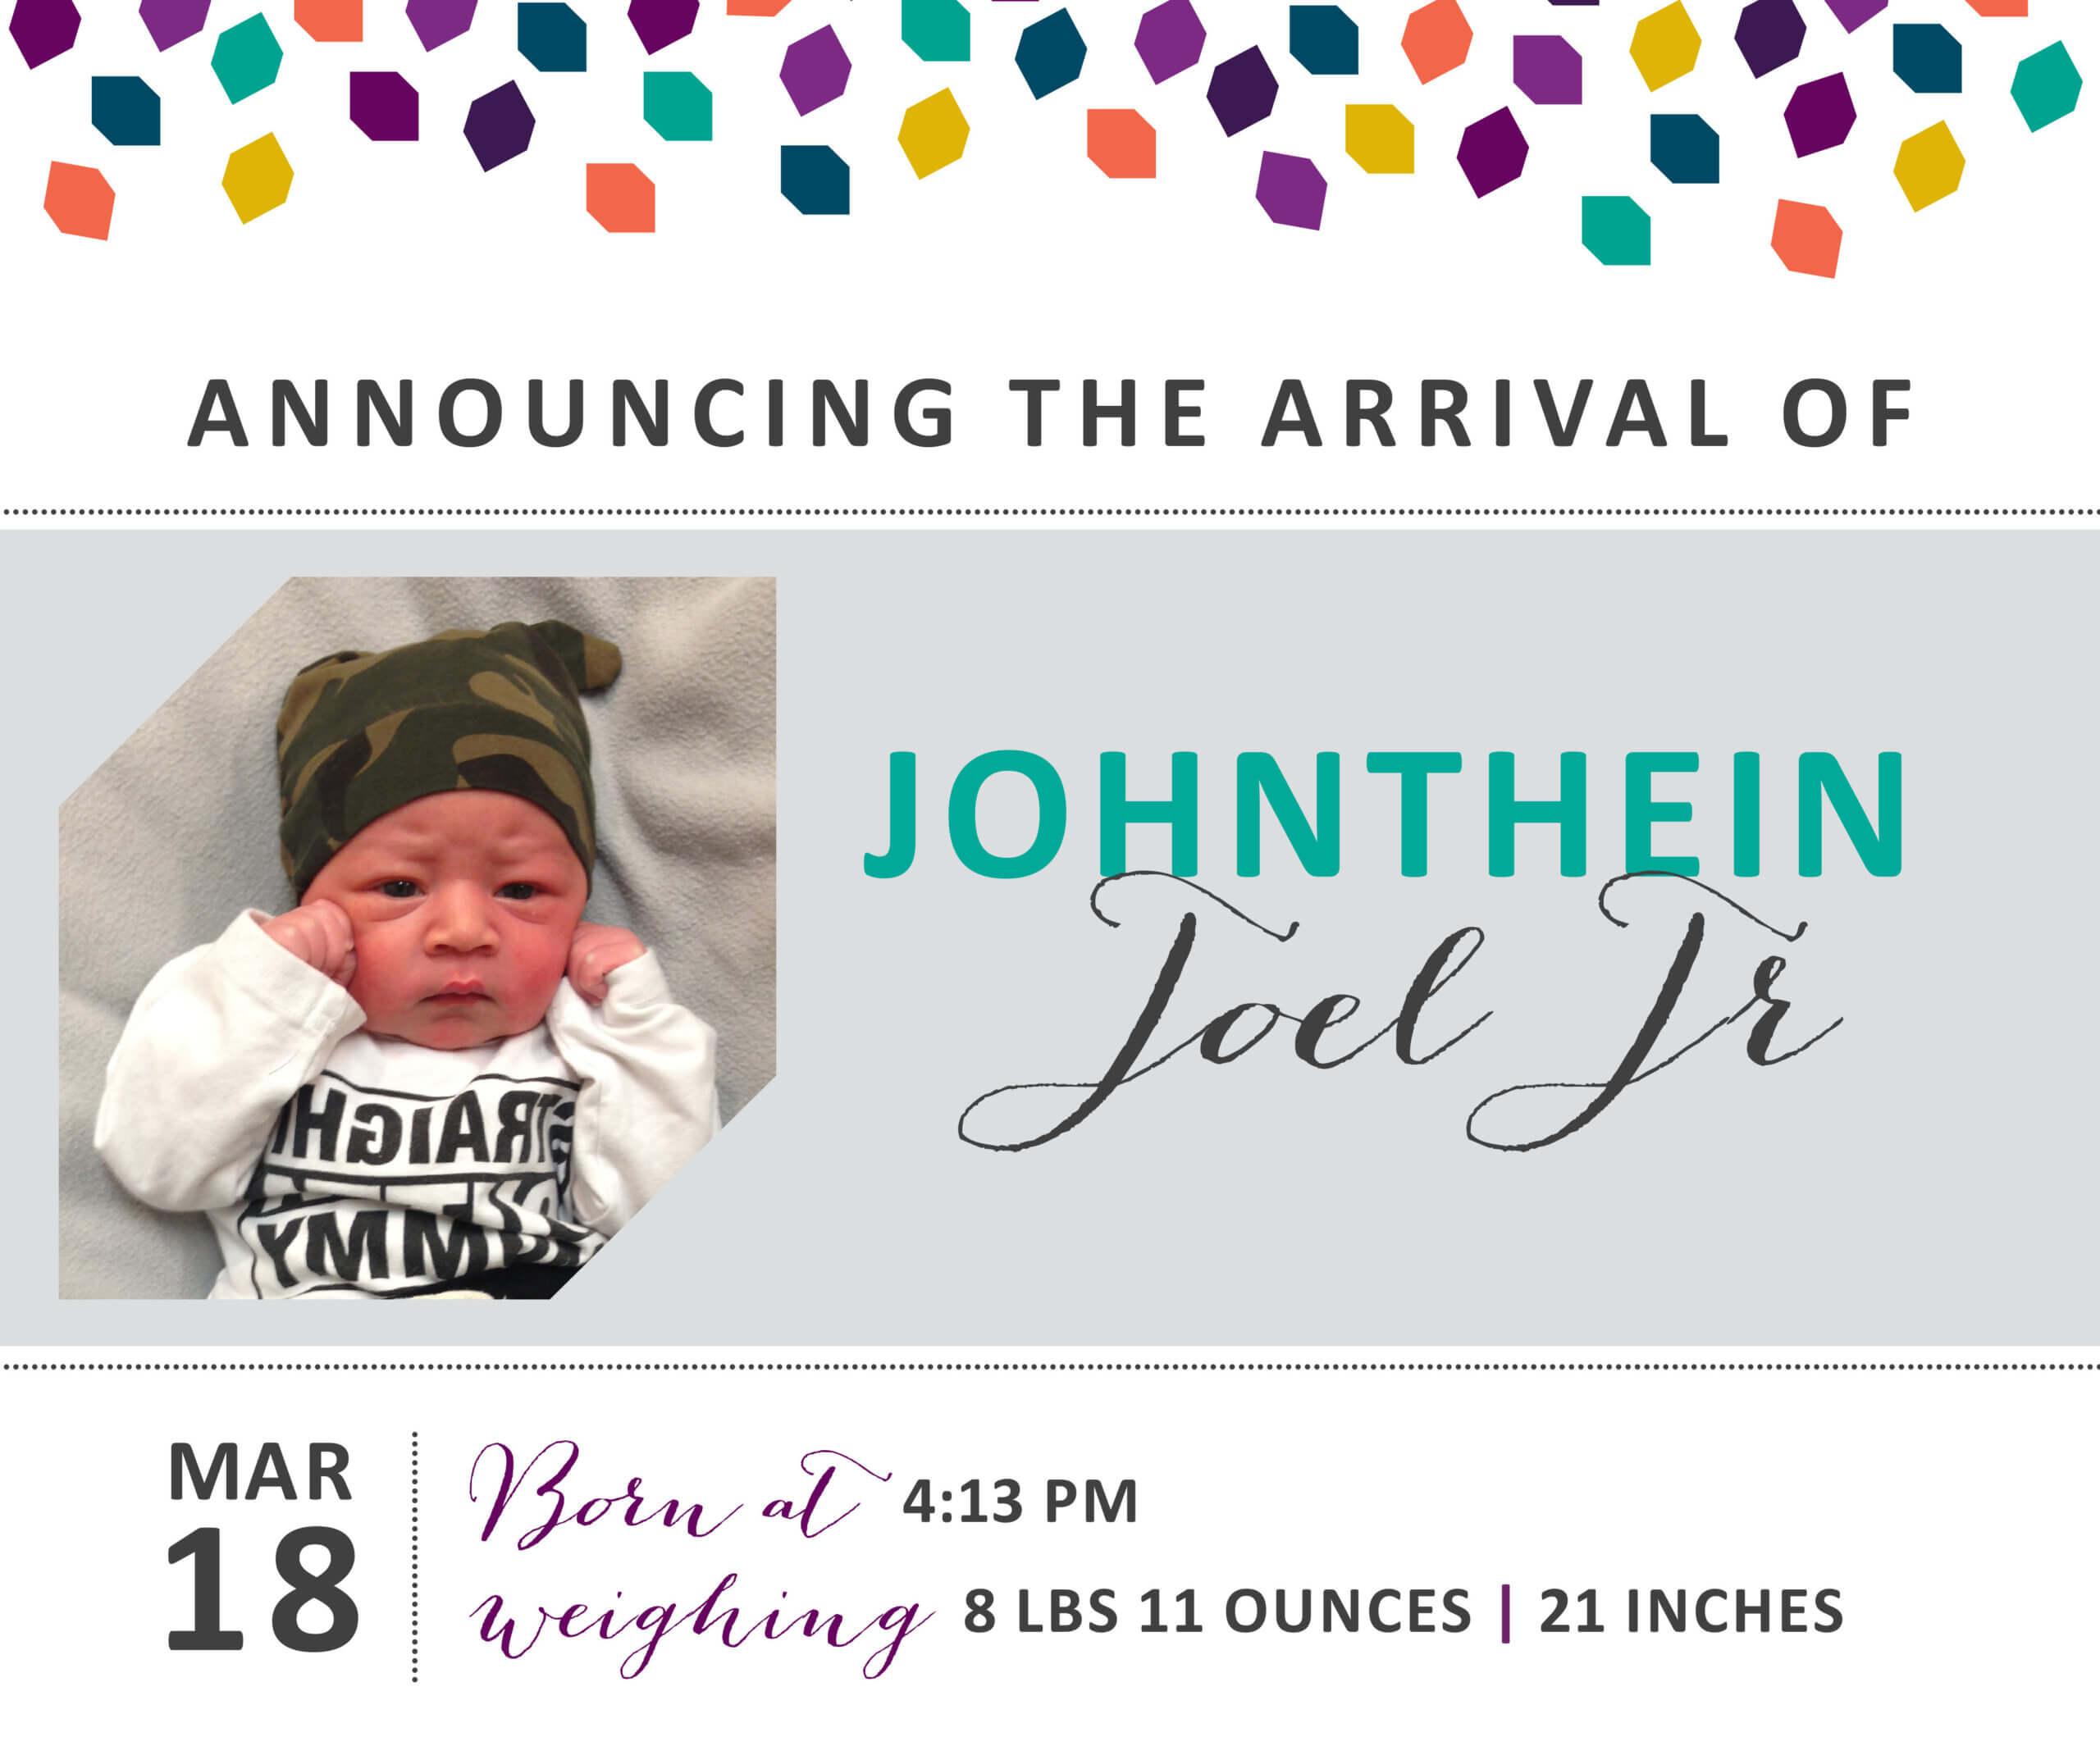 Johnthein Joel Jr 3